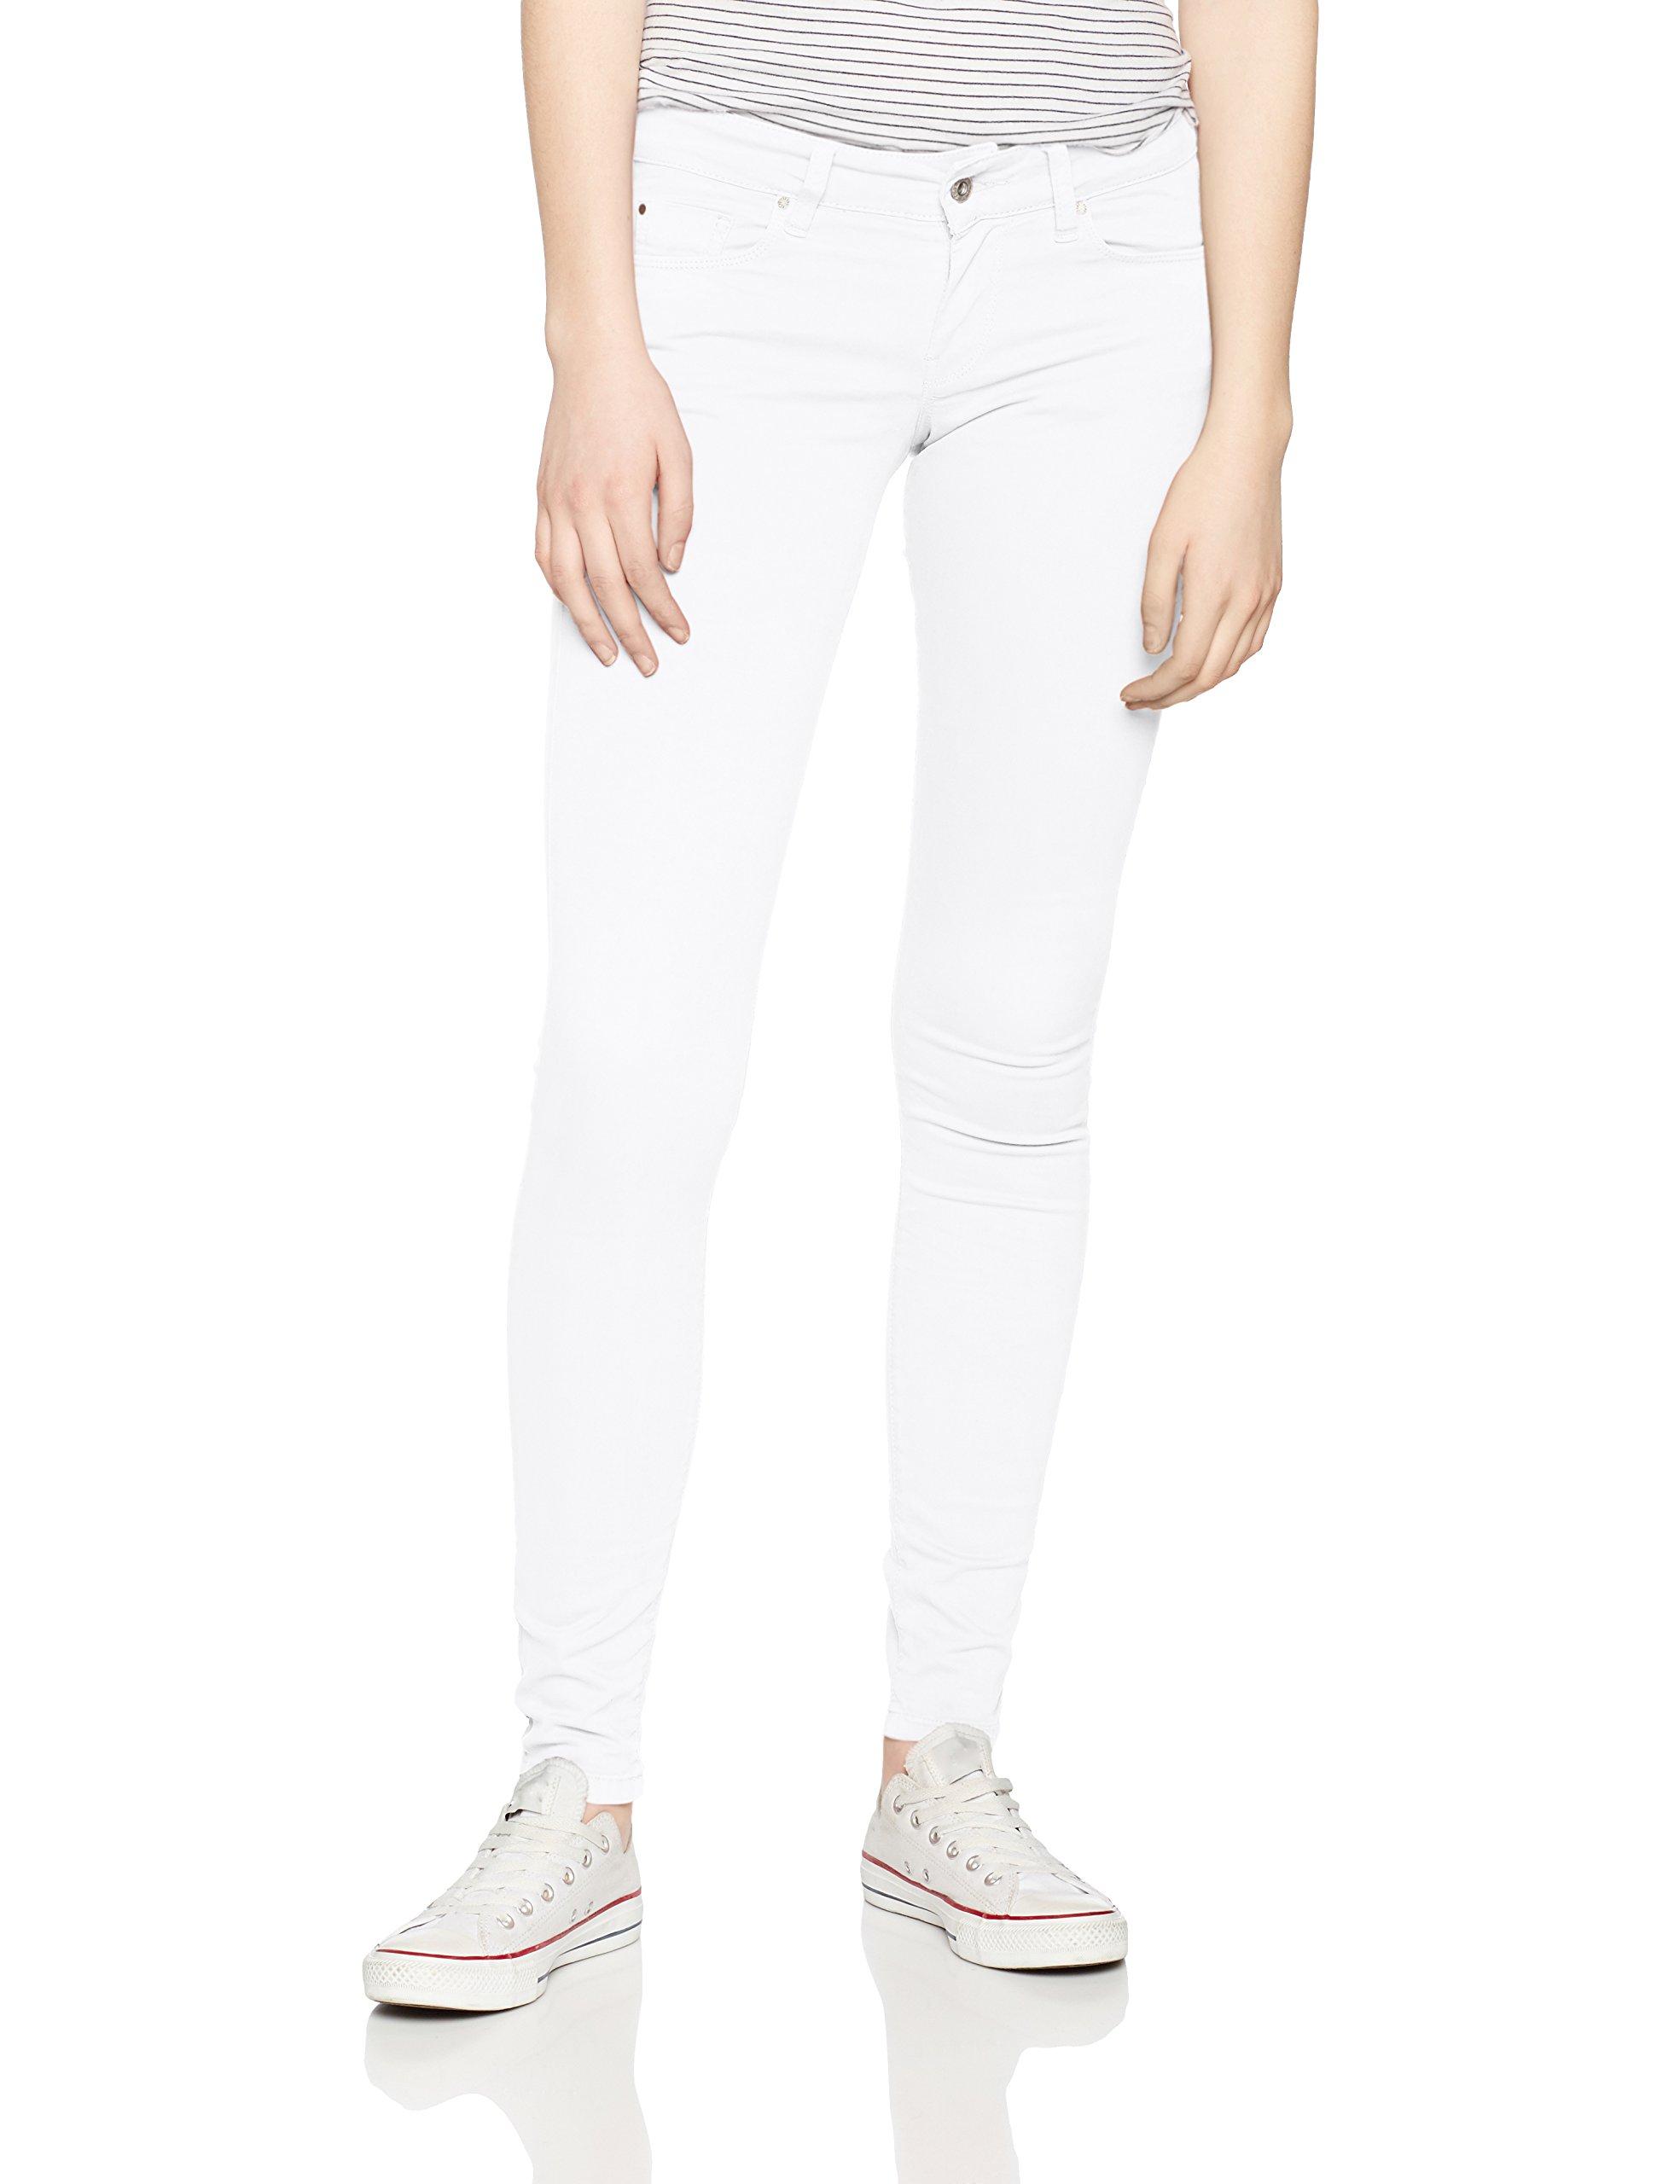 800Taille Femme 28 Pantalon Fabricant30 Soho Jeans Pepe Blancwhite N0XwnkZ8OP